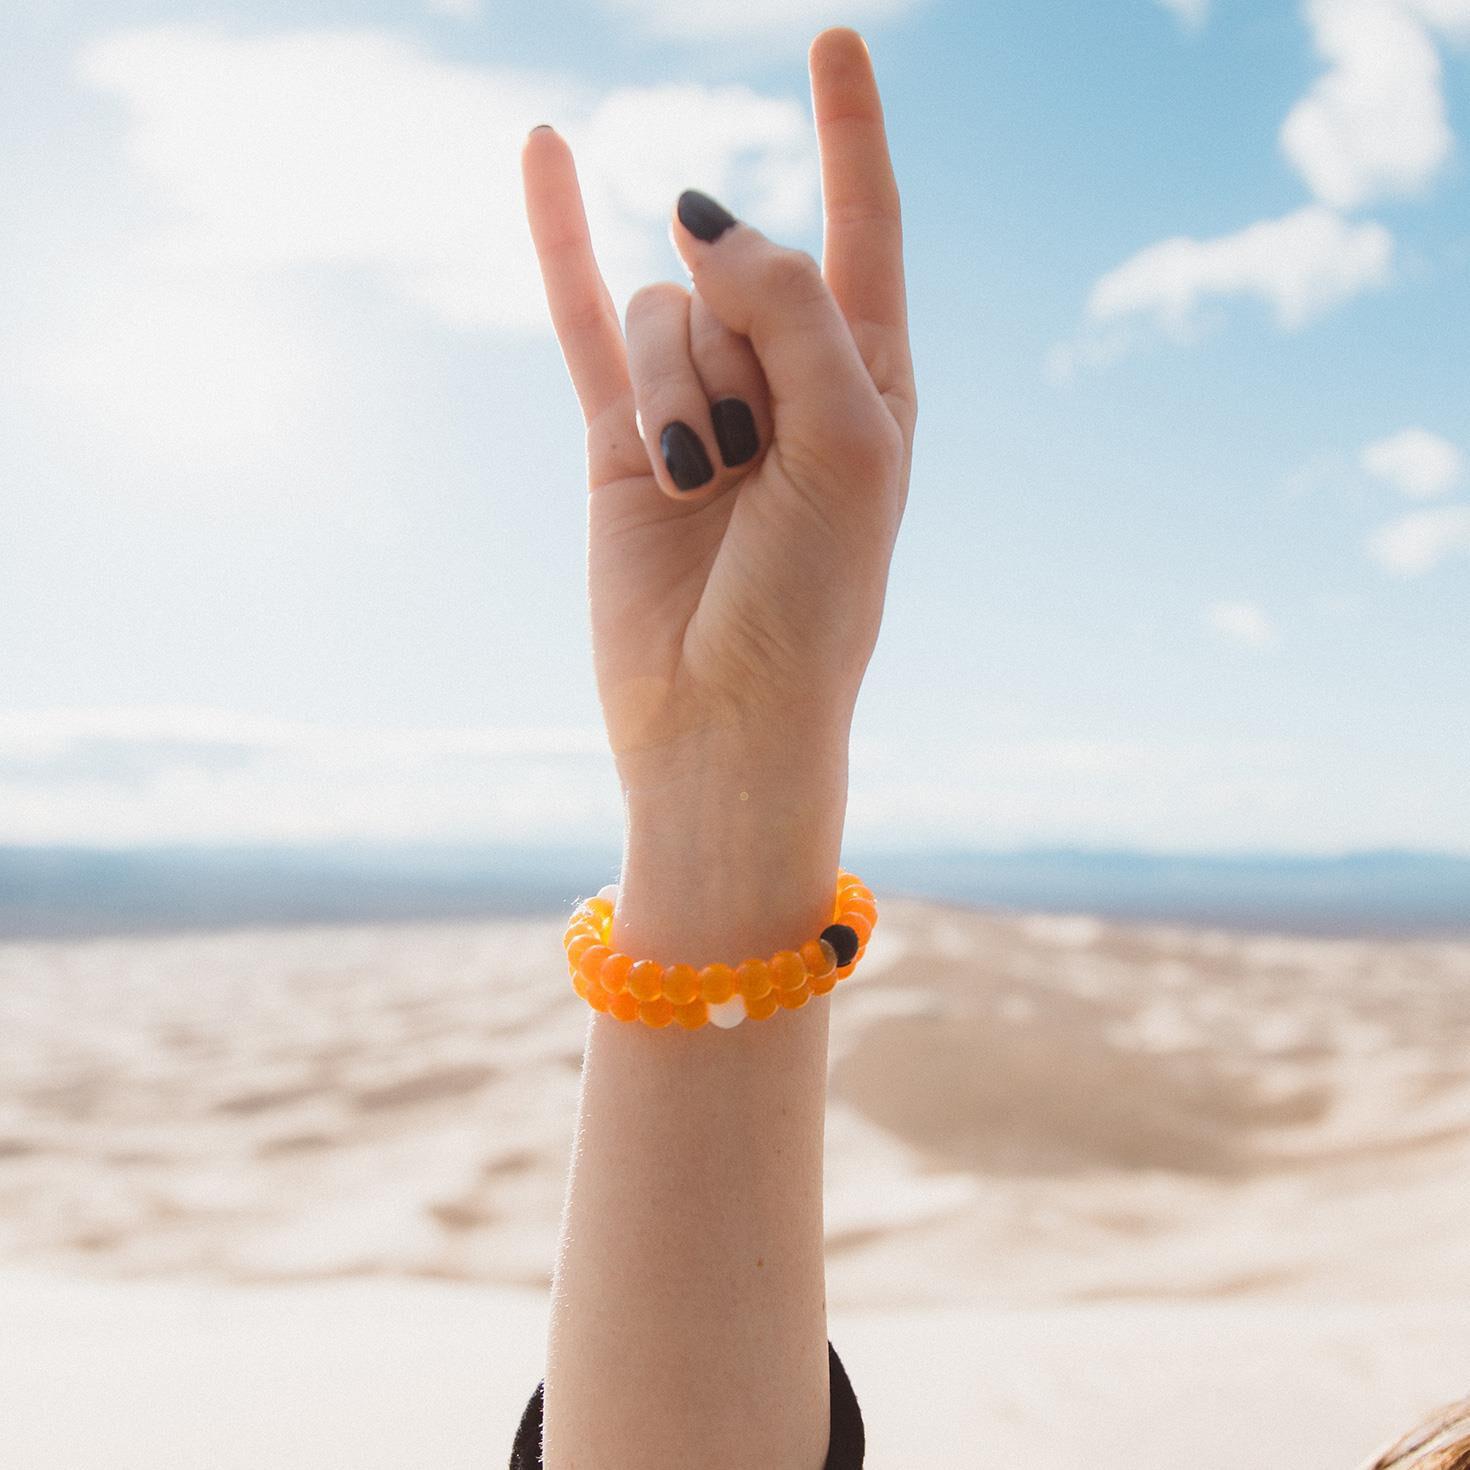 image regarding Lokai Bracelet Meaning Printable titled Confined Version (Orange) Lokai Bracelet, Medium